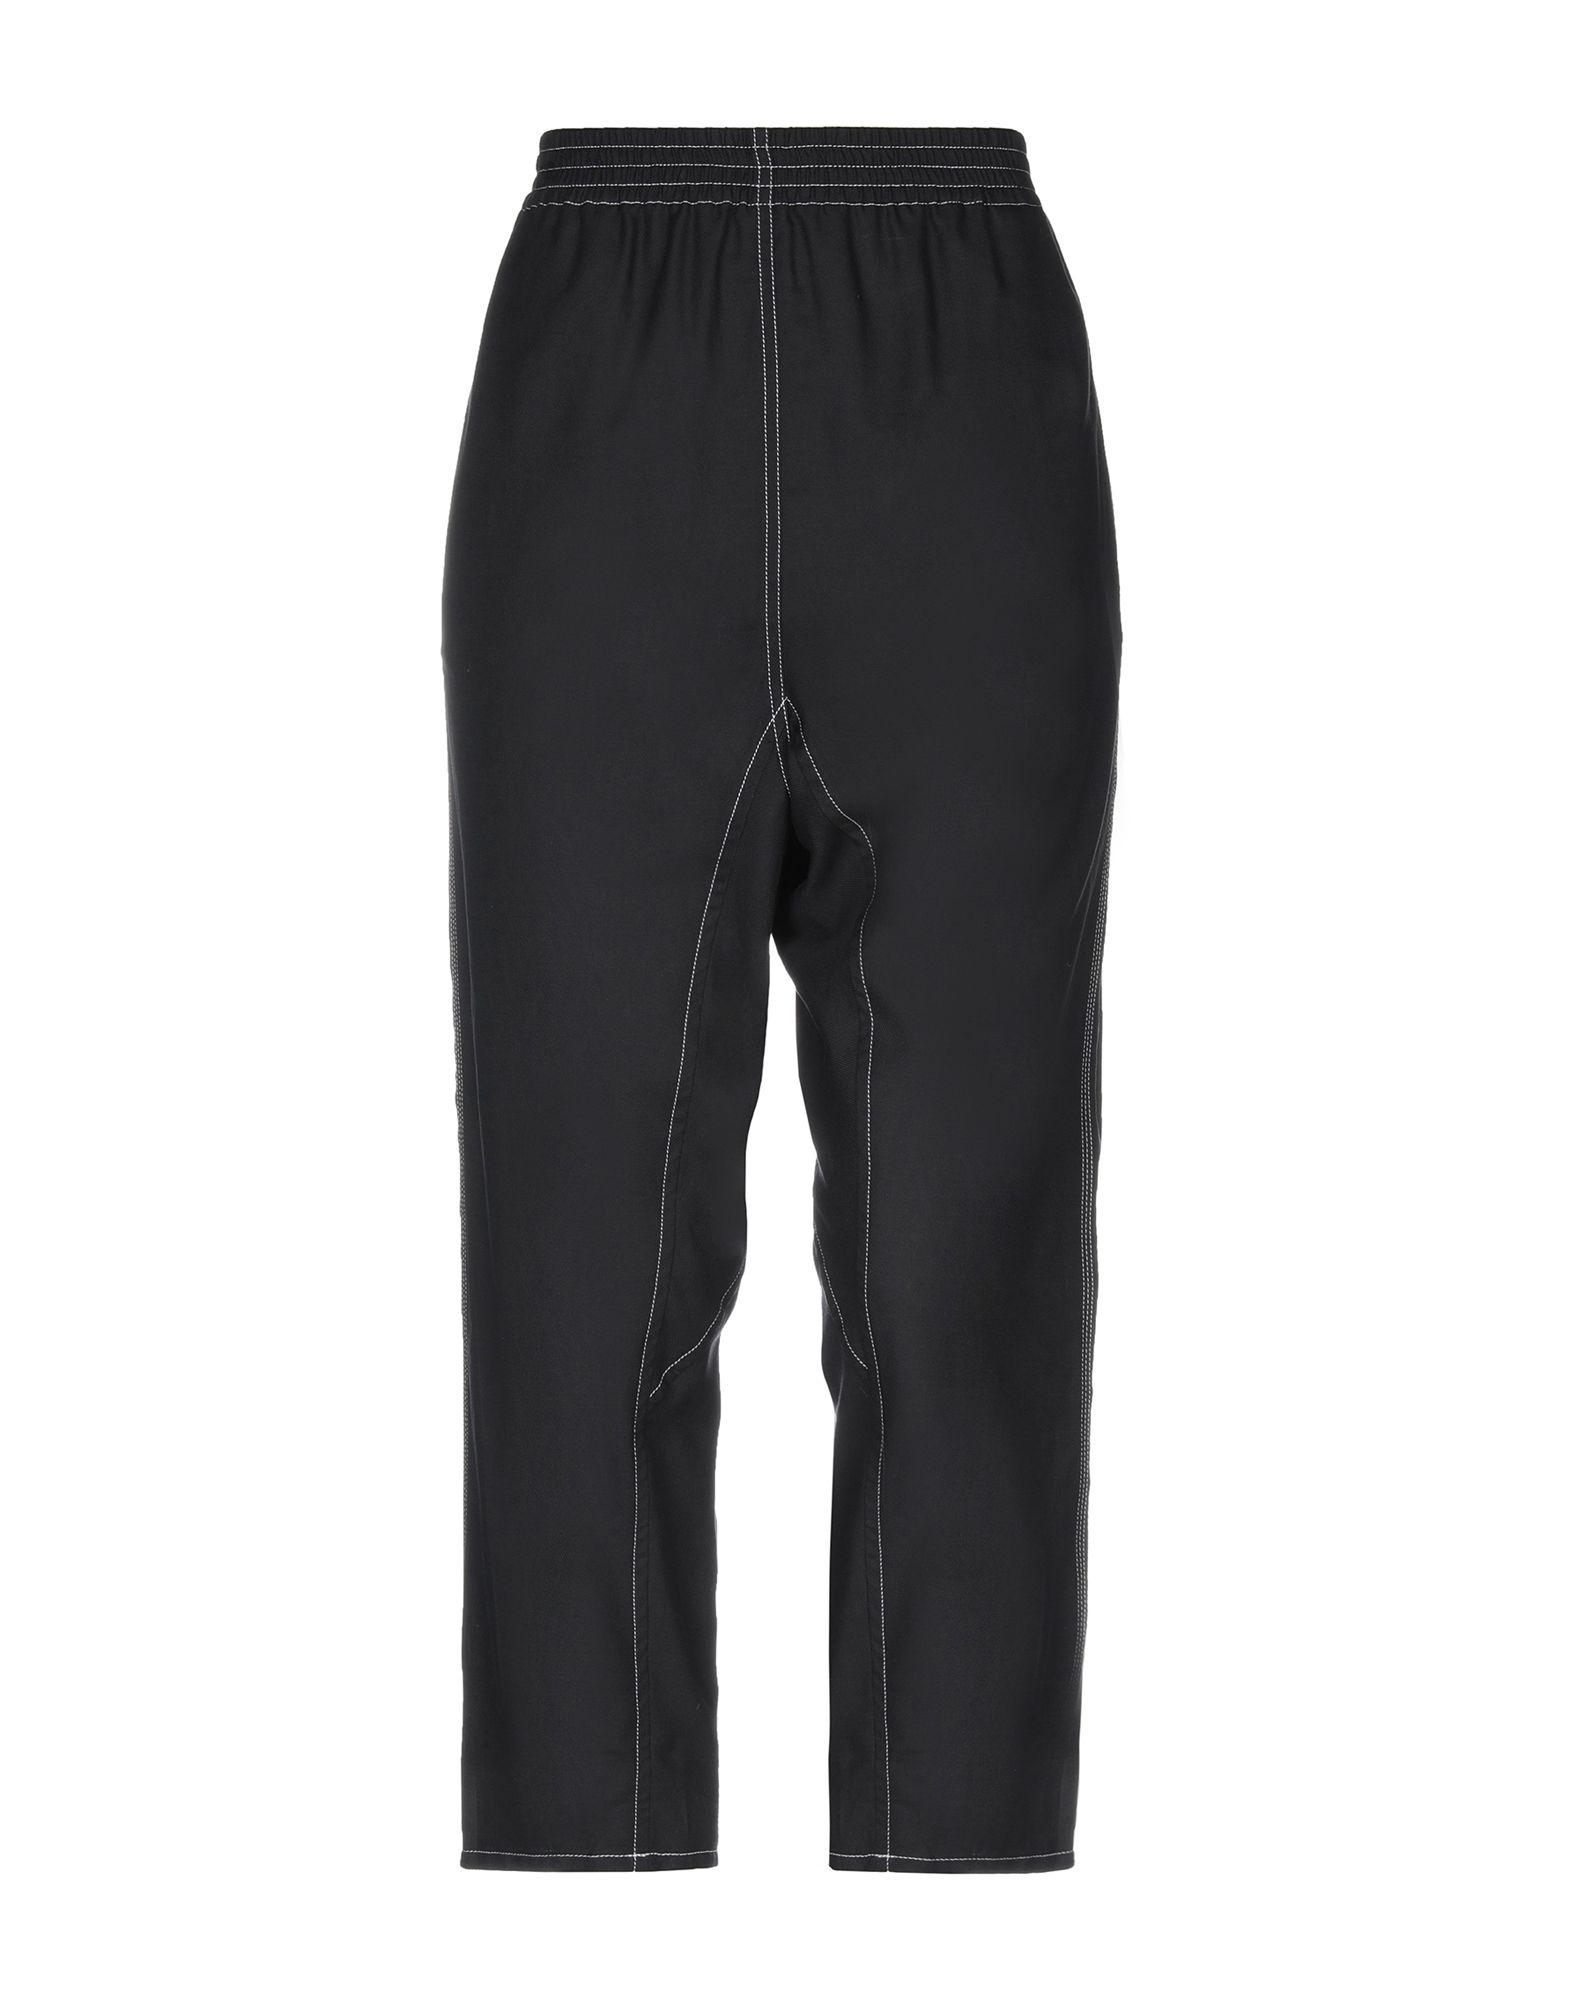 MM6 MAISON MARGIELA Повседневные брюки mm6 by maison martin margiela повседневные брюки